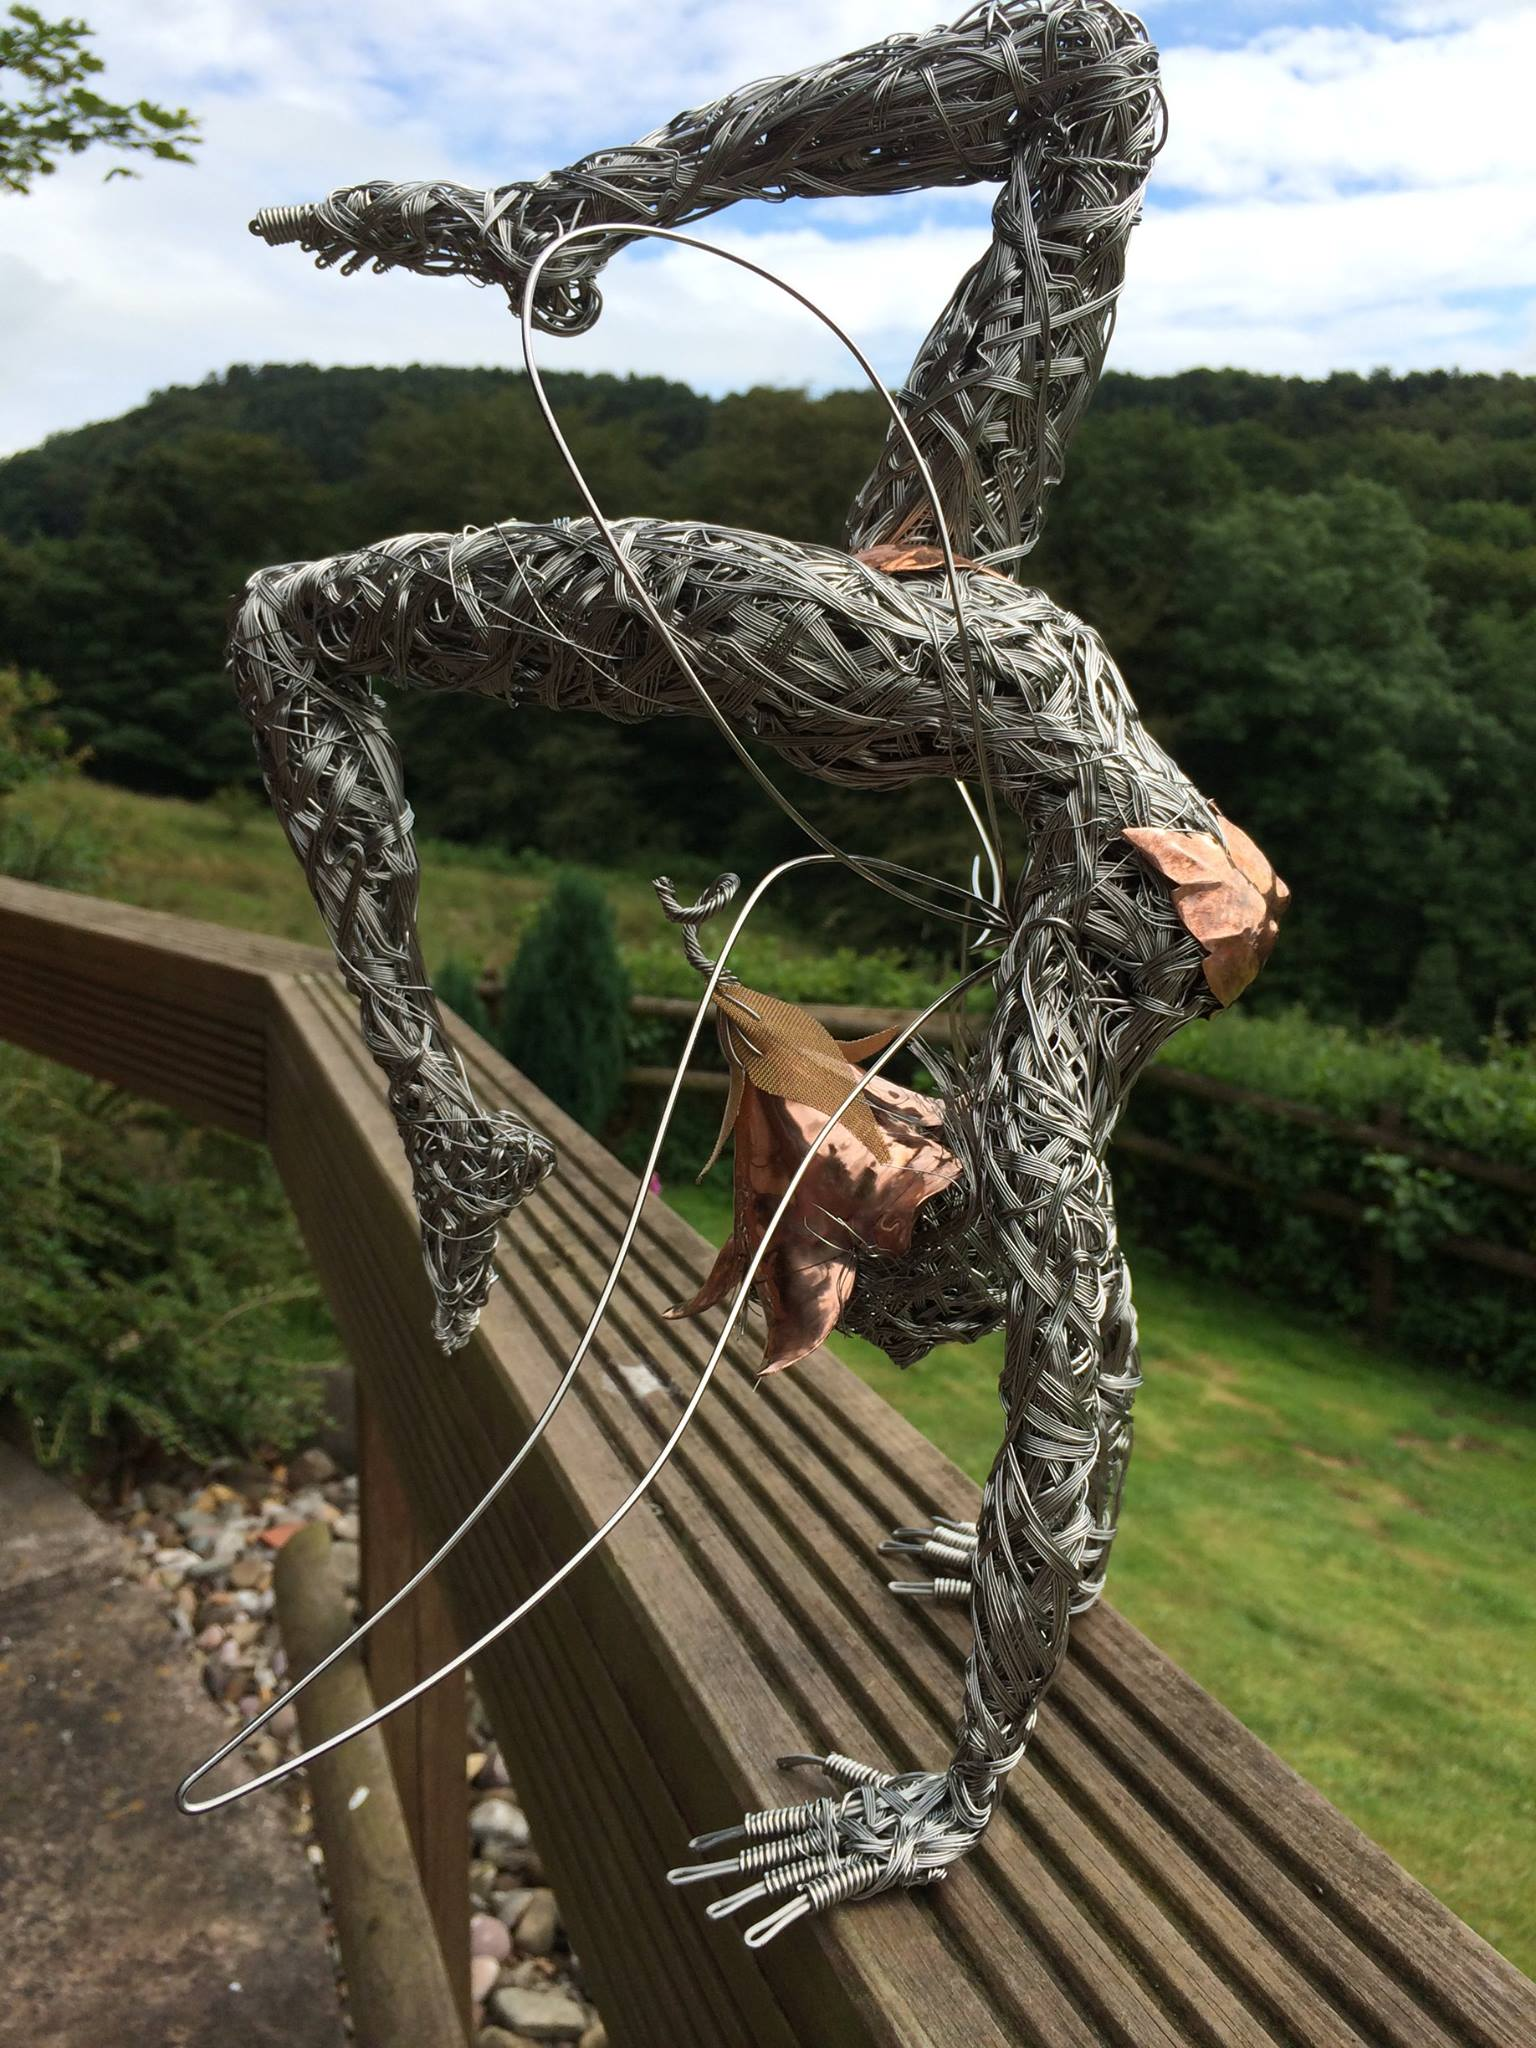 esculturas-fantasticas-de-robin-wight-18